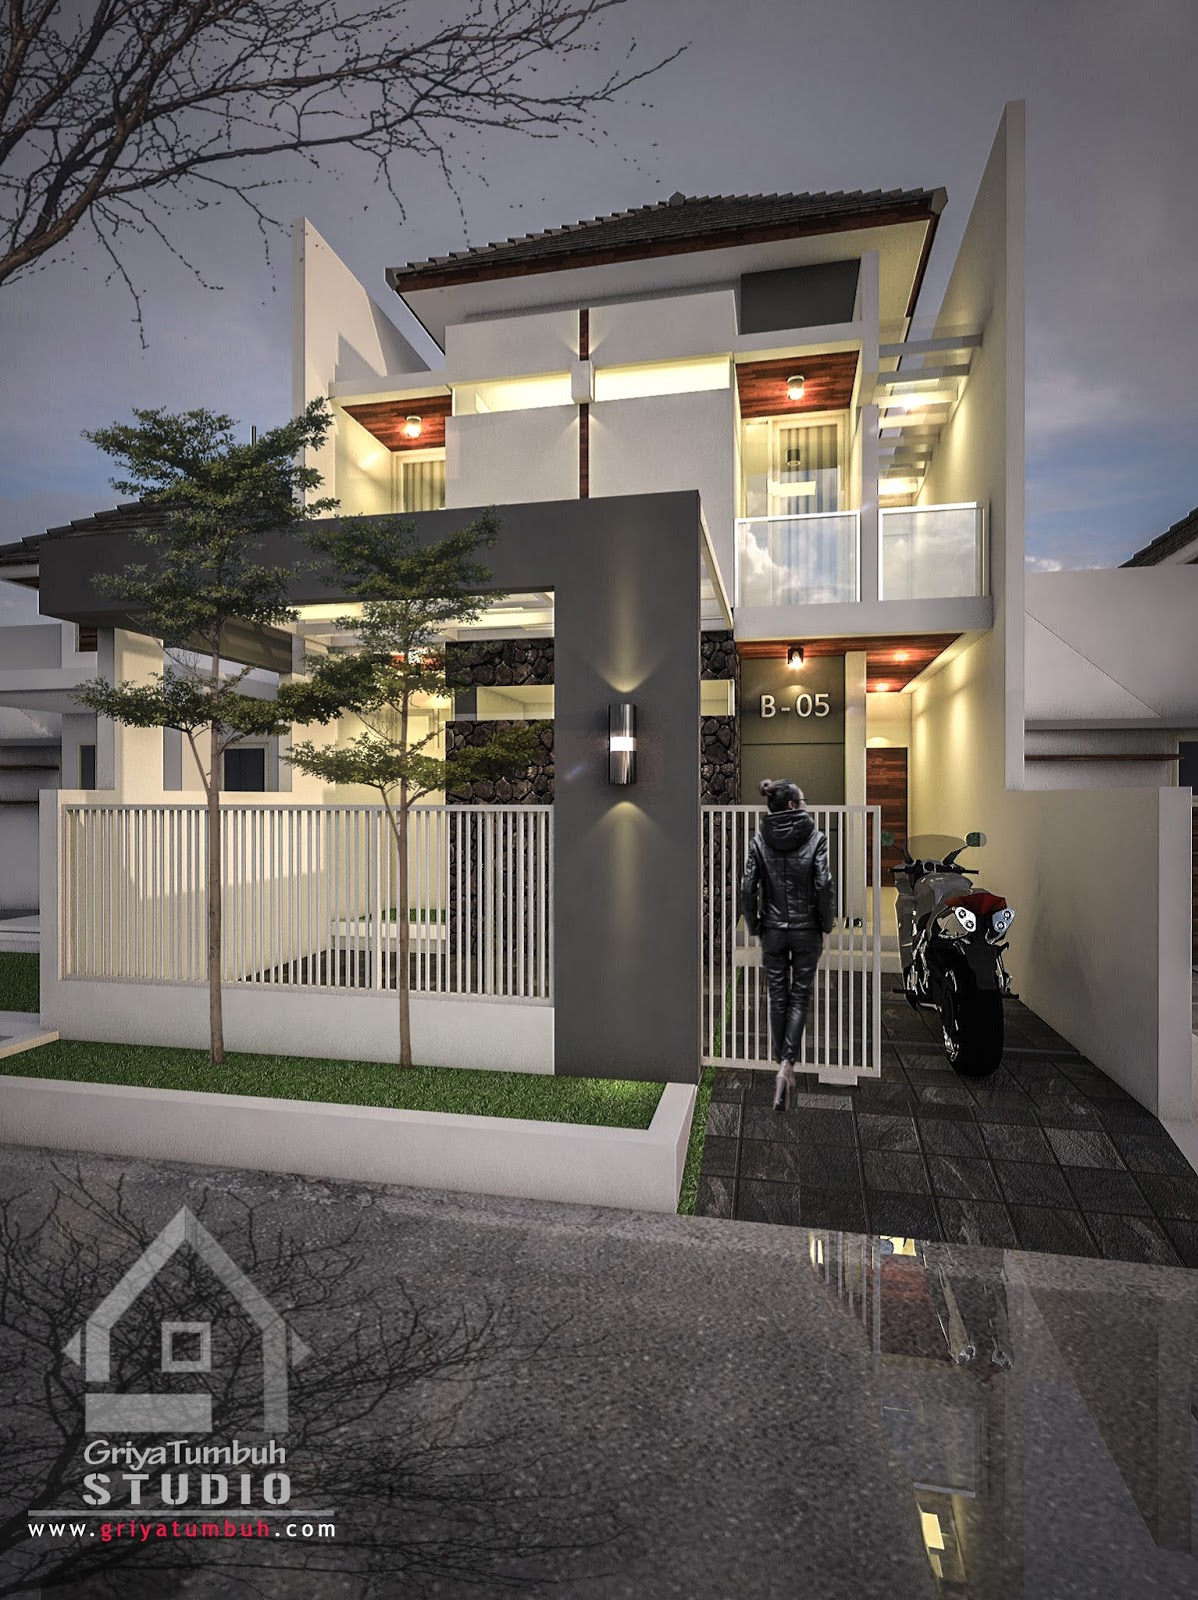 Desain Bangunan [Fasad Depan] & Desain Rumah Kos 2 Lantai Surabaya